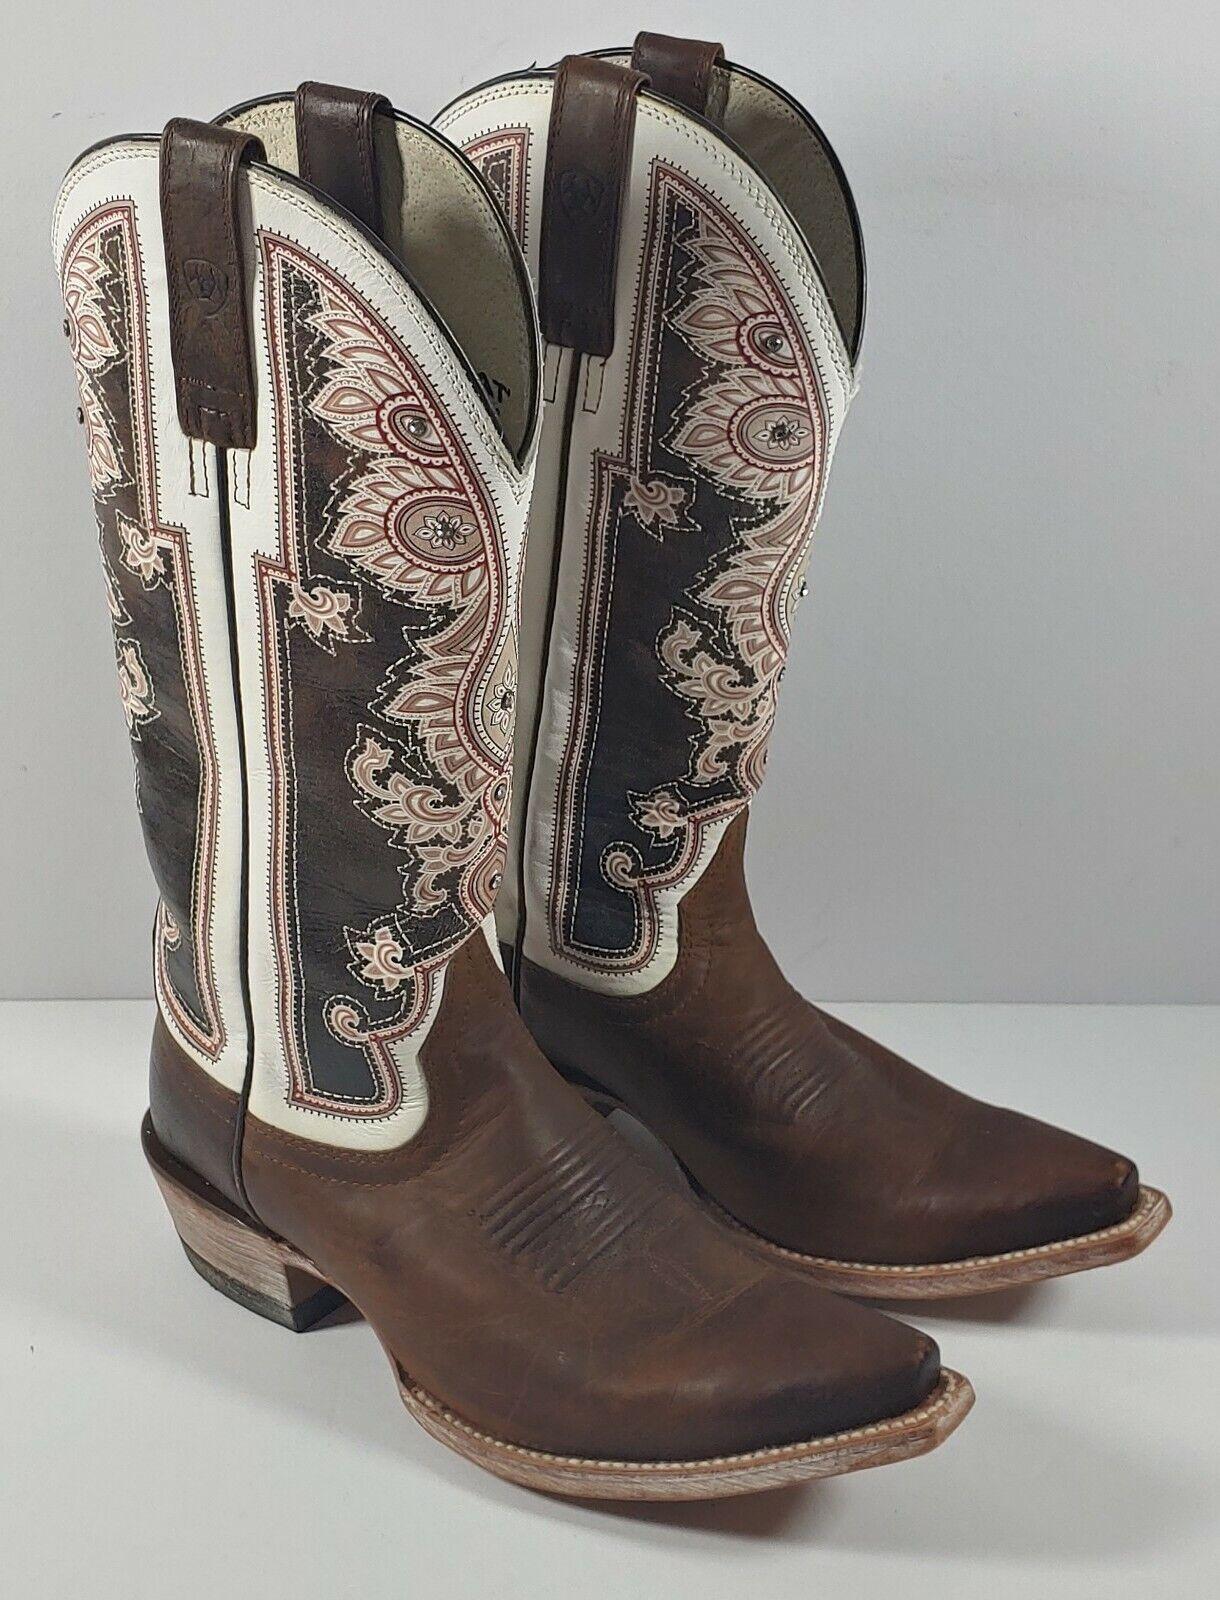 Ariat Almeda Weathered Brown Cowboy Boots 10011088 Womens Sz 7.5B